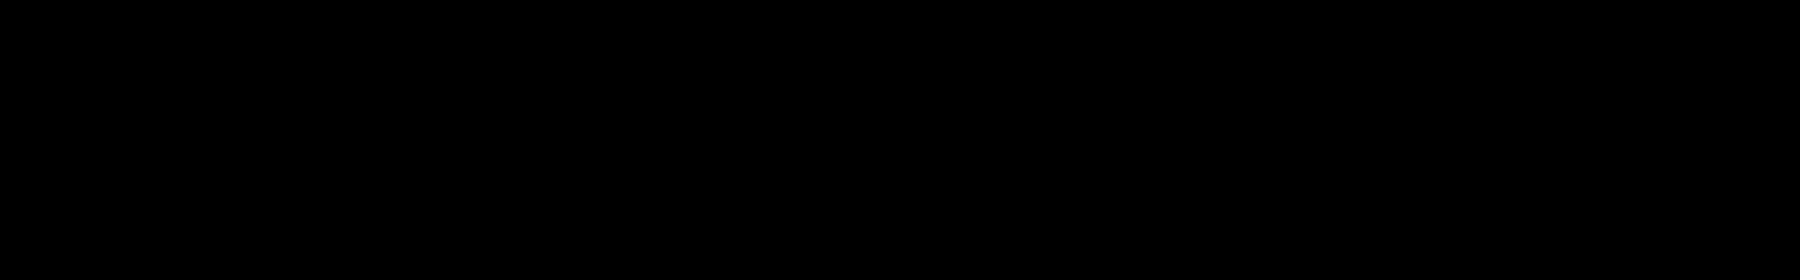 Ultra RIDDIM audio waveform